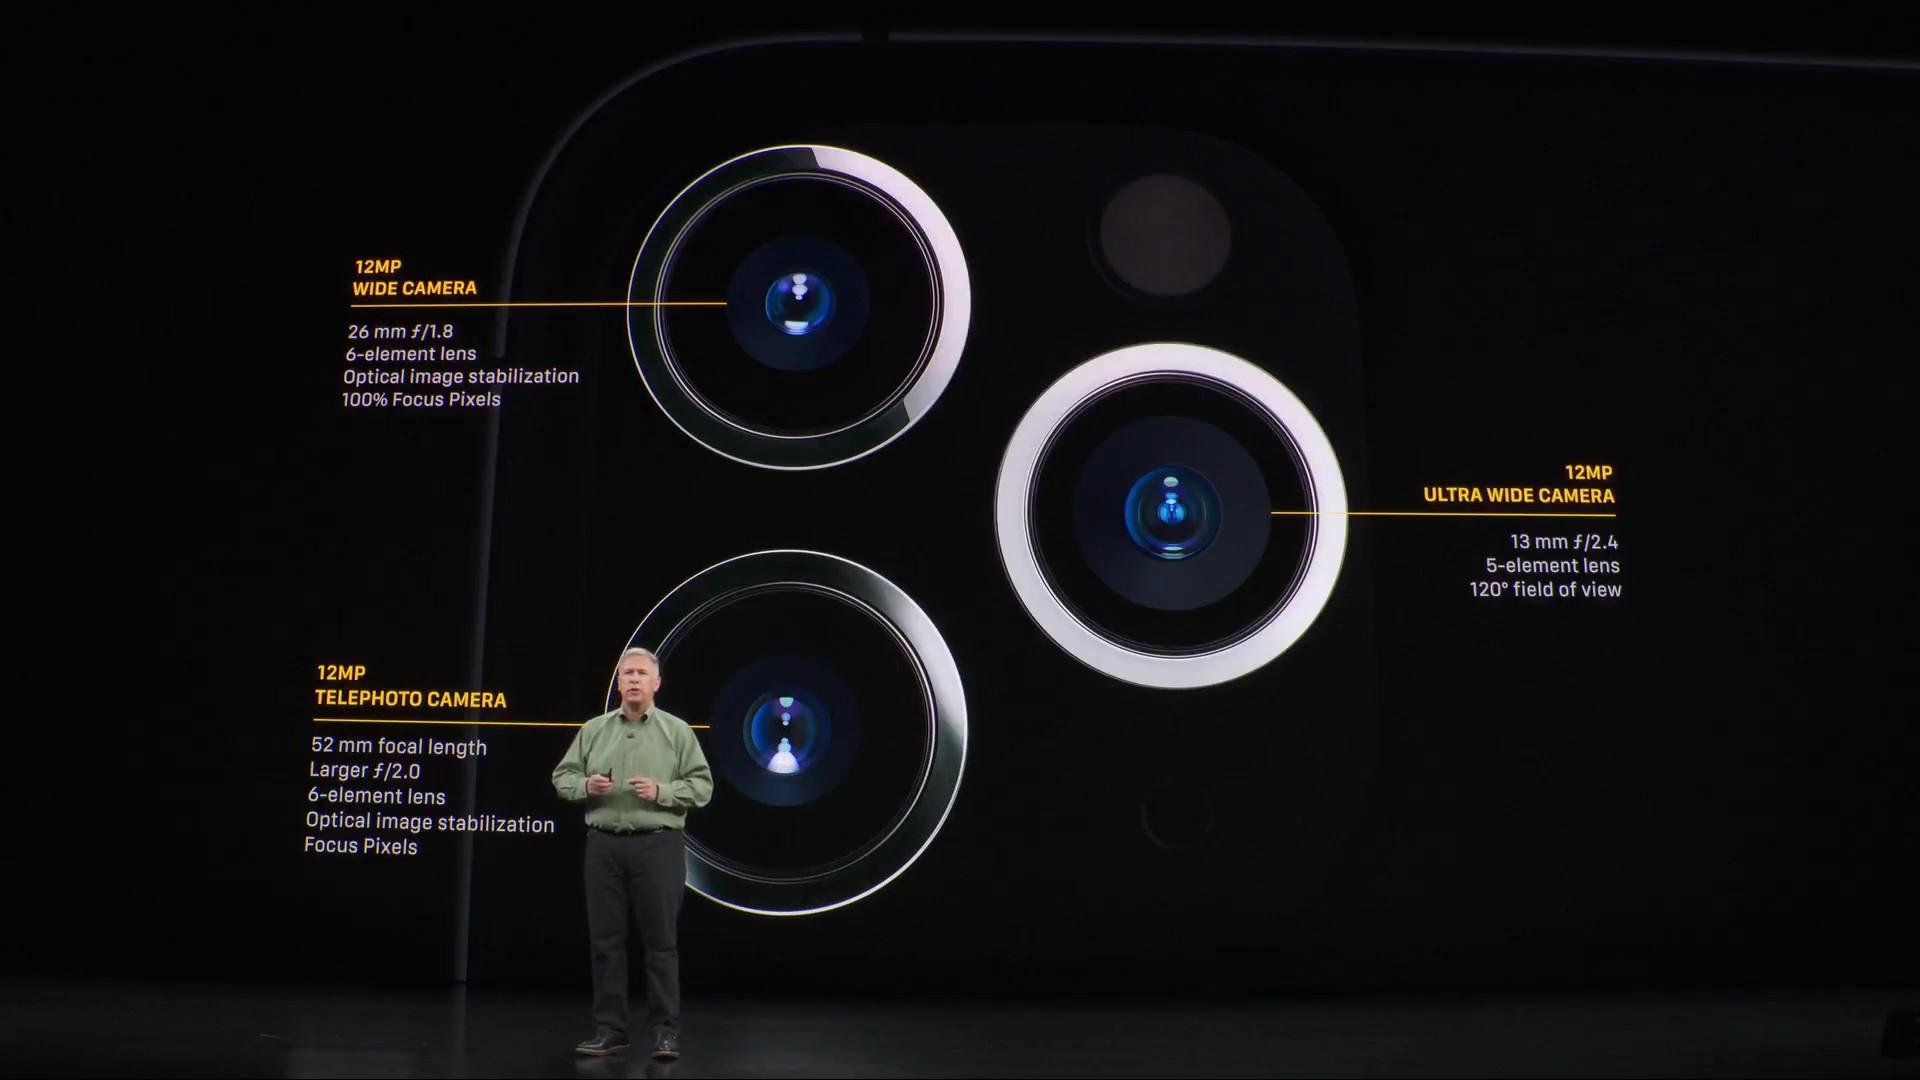 iPhone 11 Pro / iPhone 11 Pro Max 三鏡頭